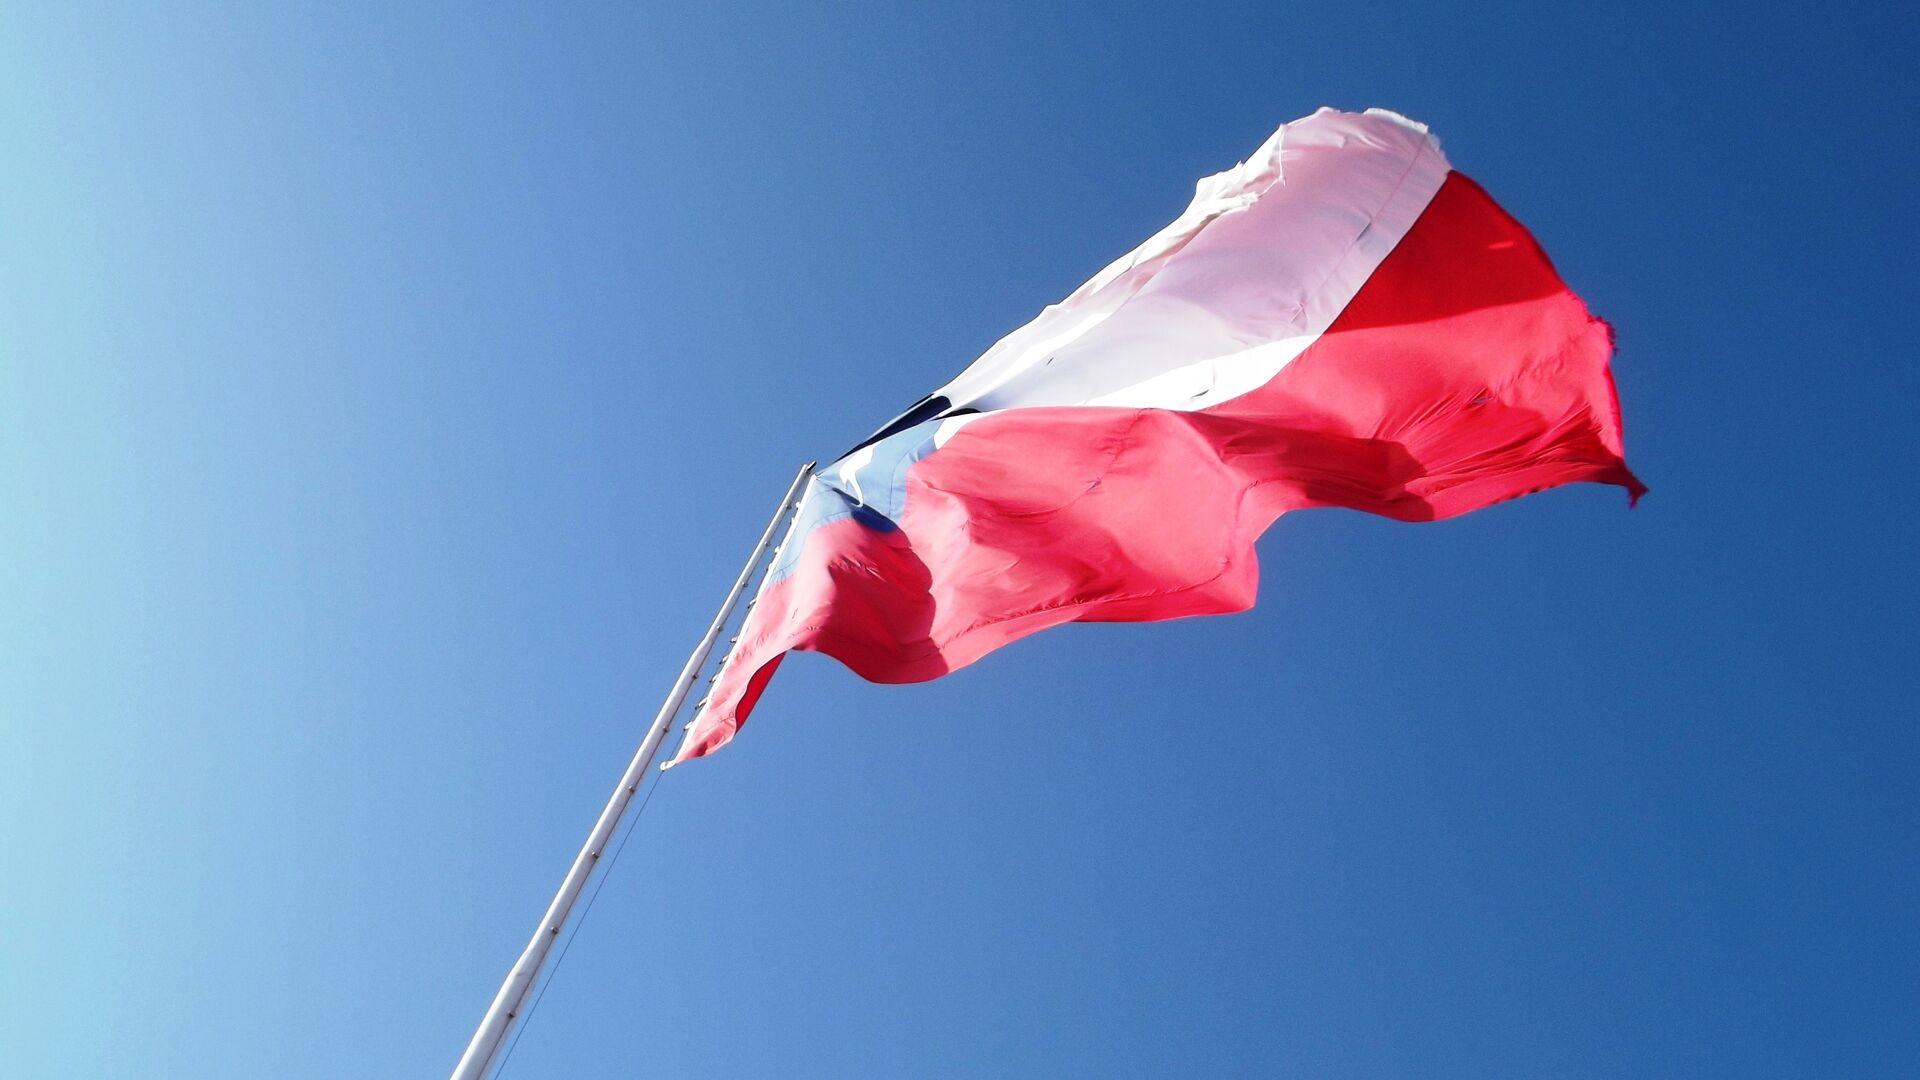 La bandera de Chile - Sputnik Mundo, 1920, 15.03.2021